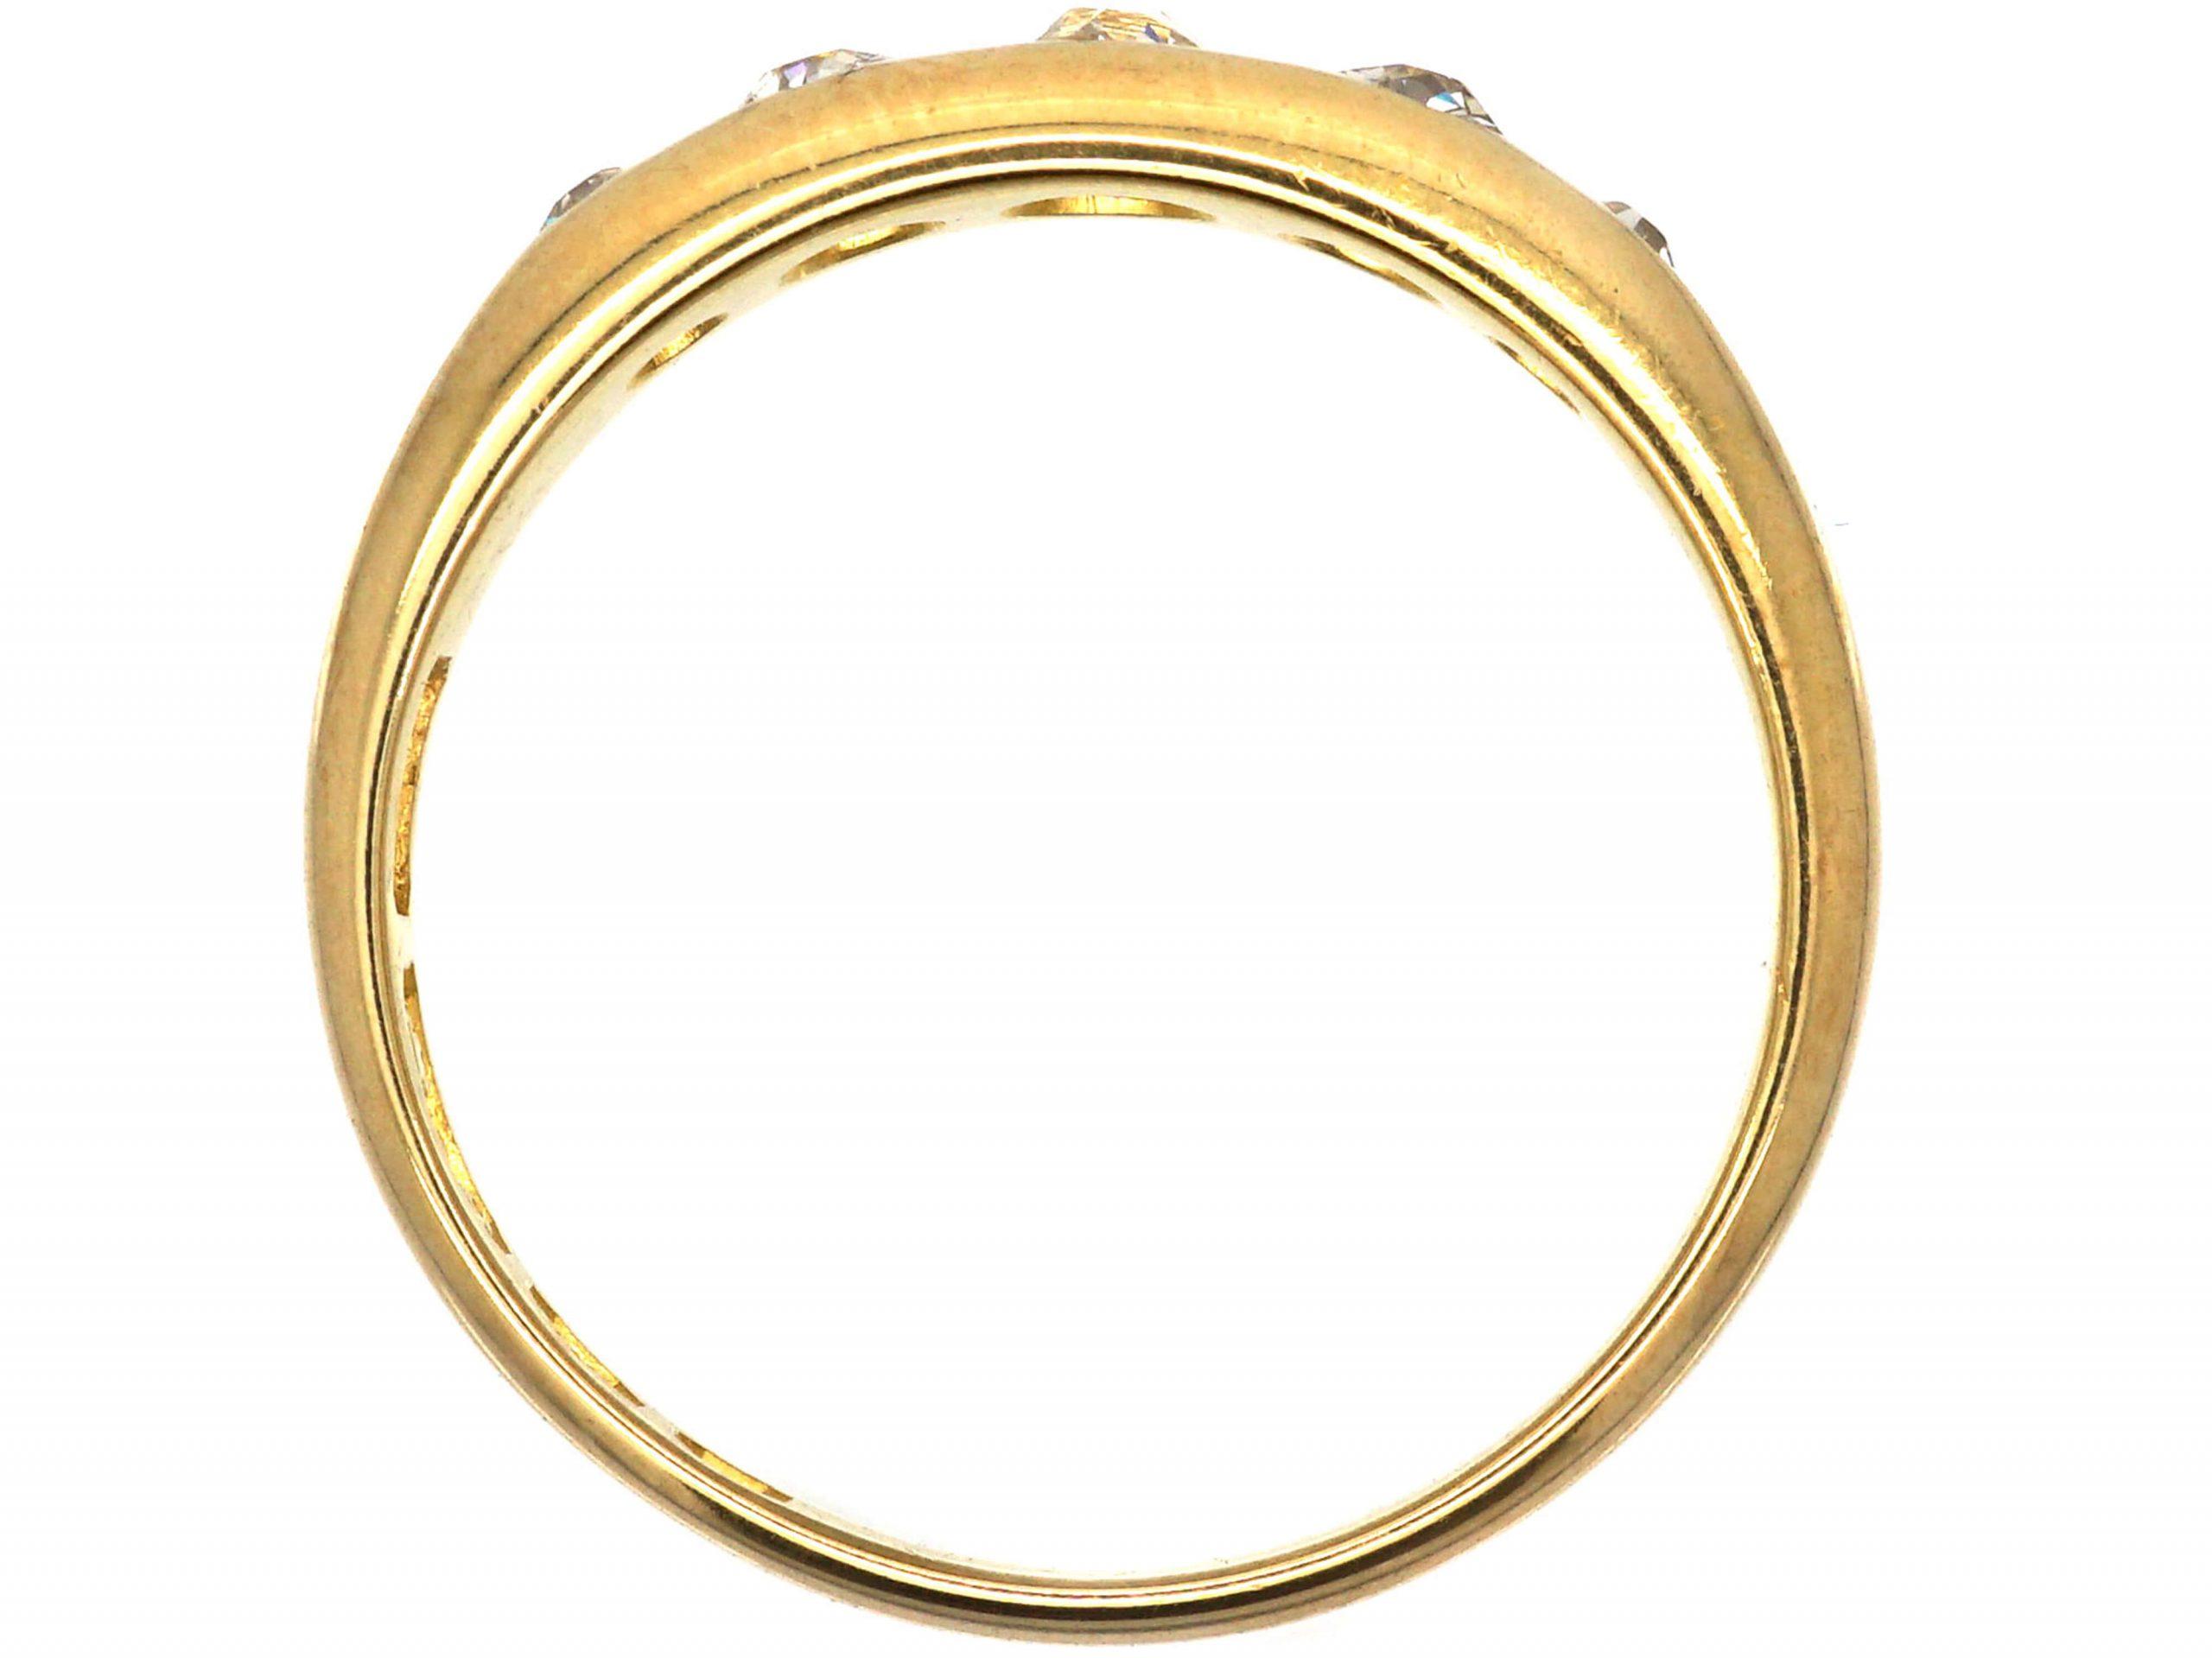 Victorian 18ct Gold, Five Stone Rub Over Set Diamond Ring